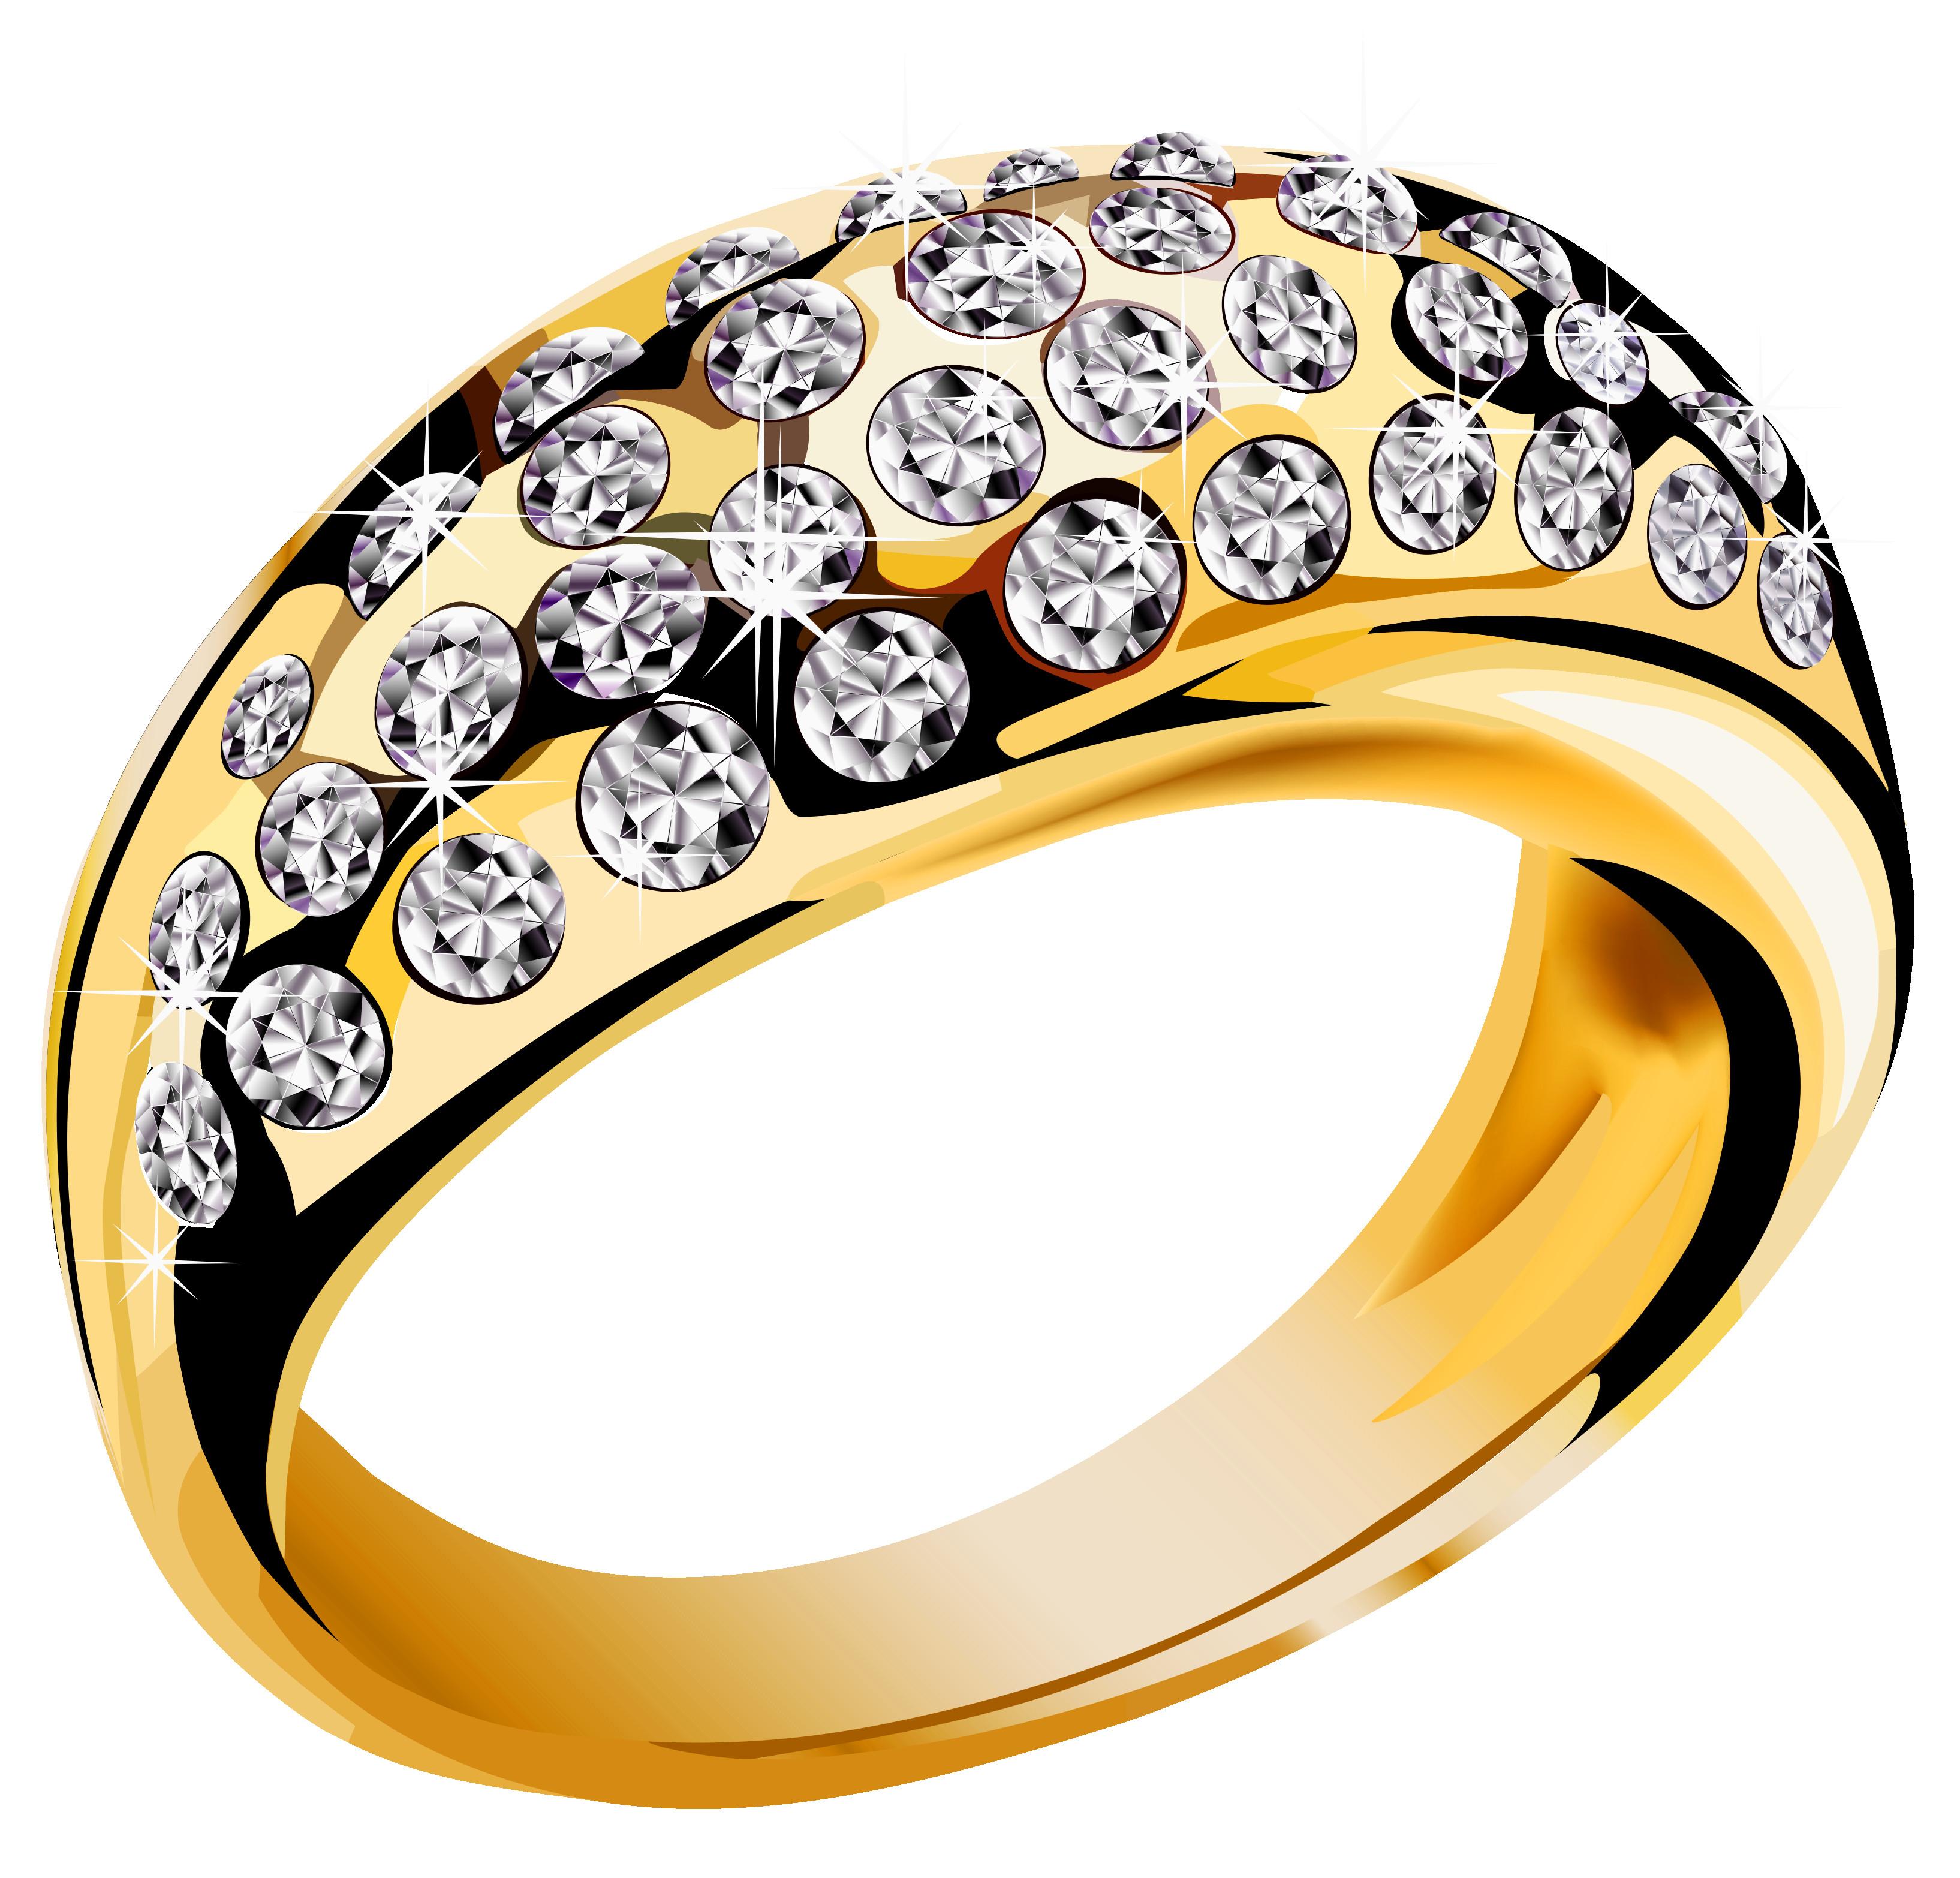 3269x3132 Wedding Ring Gold Engagement Clip Art Unbelievable Png Transitionsfv